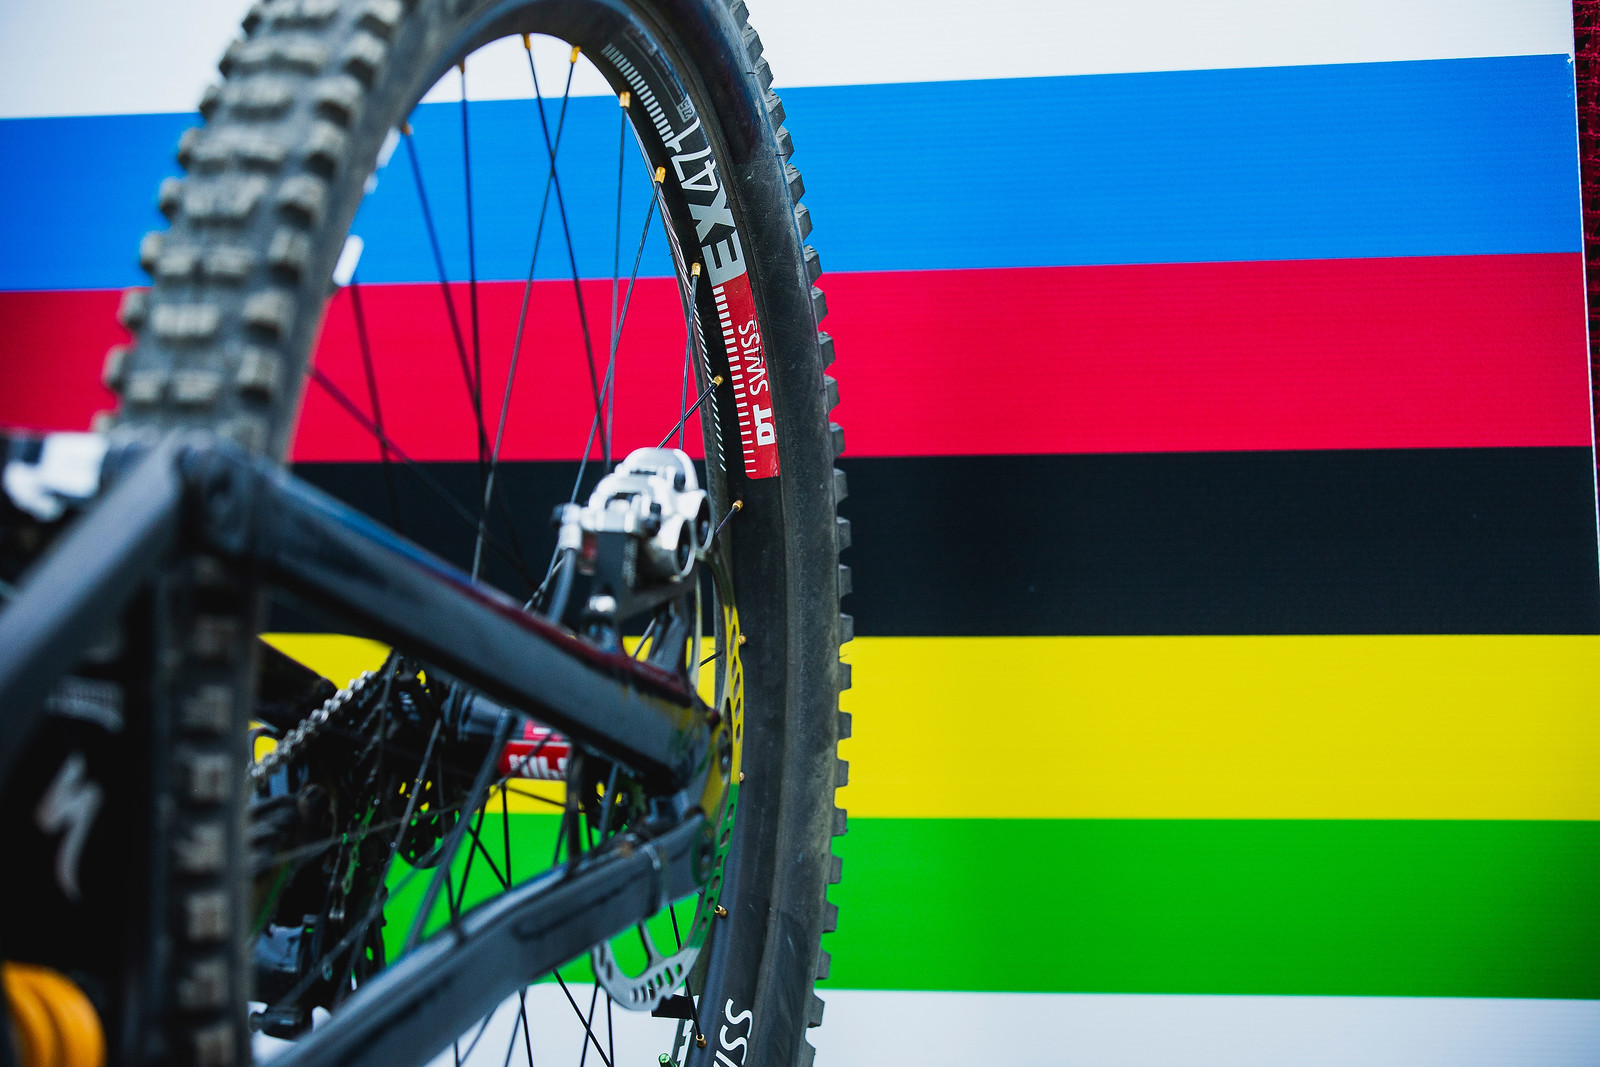 World Championships Winning Bike: Loic Bruni's Specialized Demo 29 - Winning Bike: Loic Bruni's Specialized Demo 29 - Mountain Biking Pictures - Vital MTB